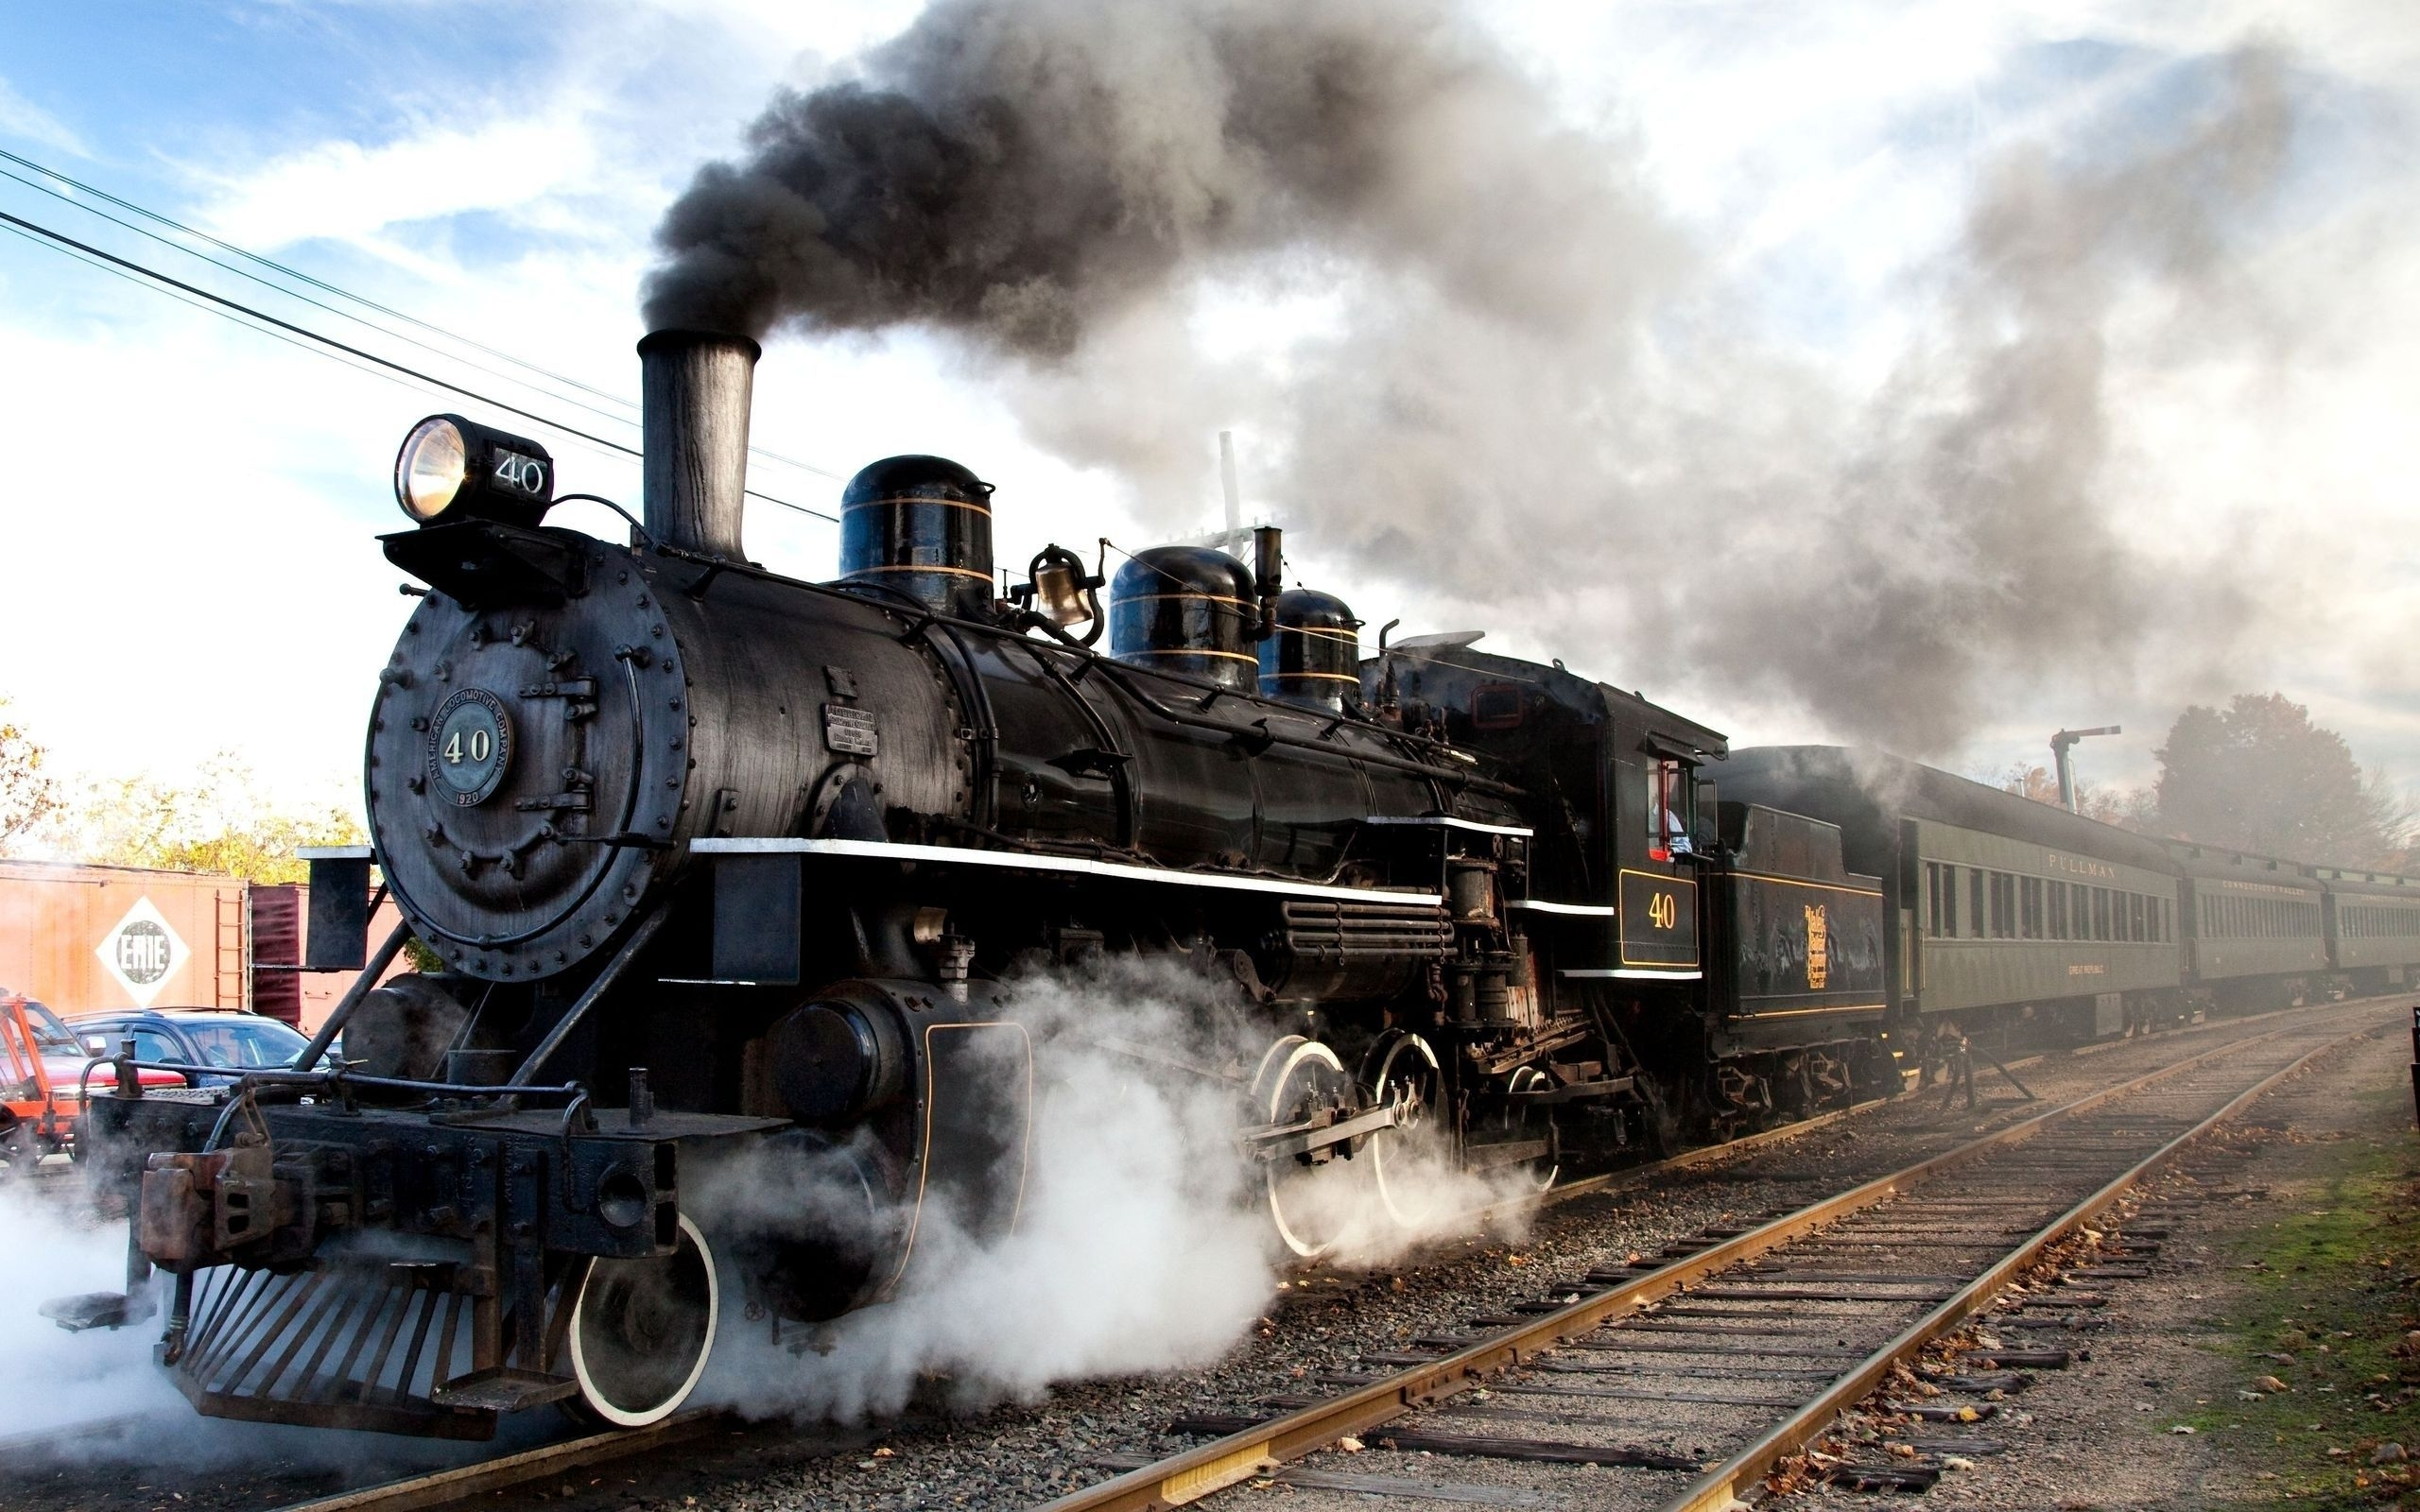 train wallpaper images #d5re 2560x1600 px 1.01 mb vehicletrain